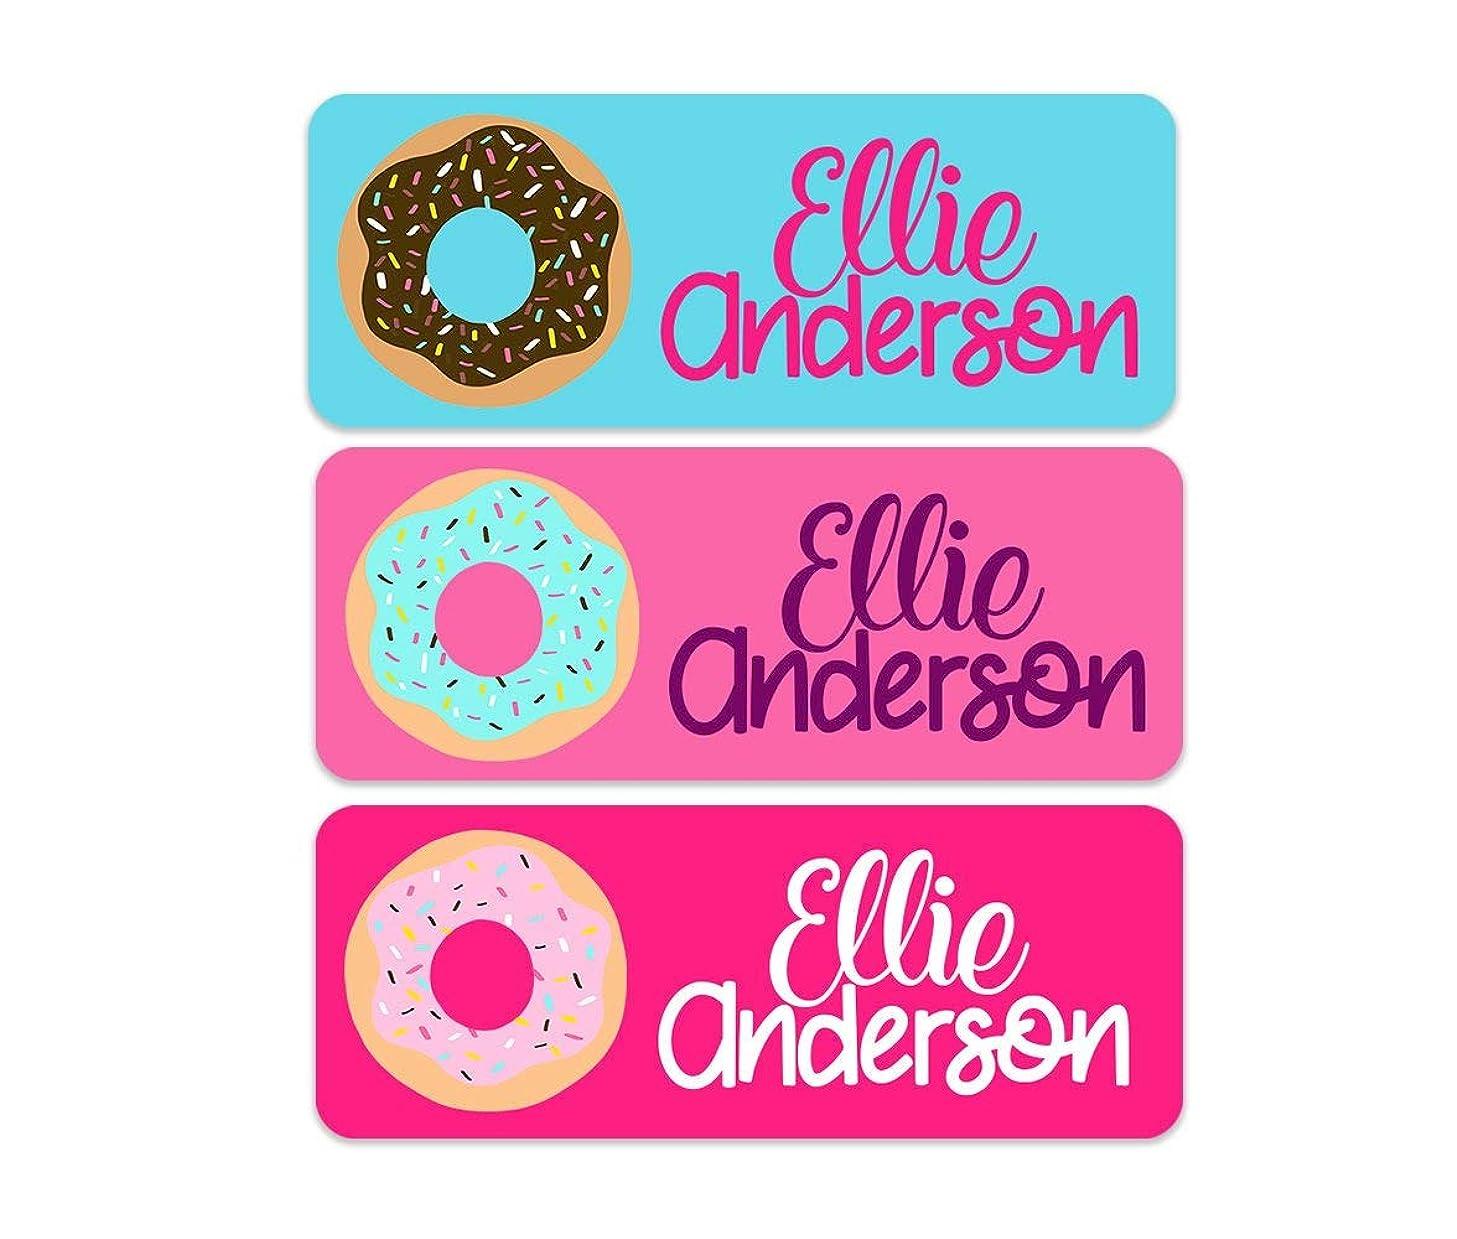 Waterproof Name Labels - Donut Name Labels - Girls Name Labels - Kids School Name Labels - Personalized Name Labels - 30 Labels